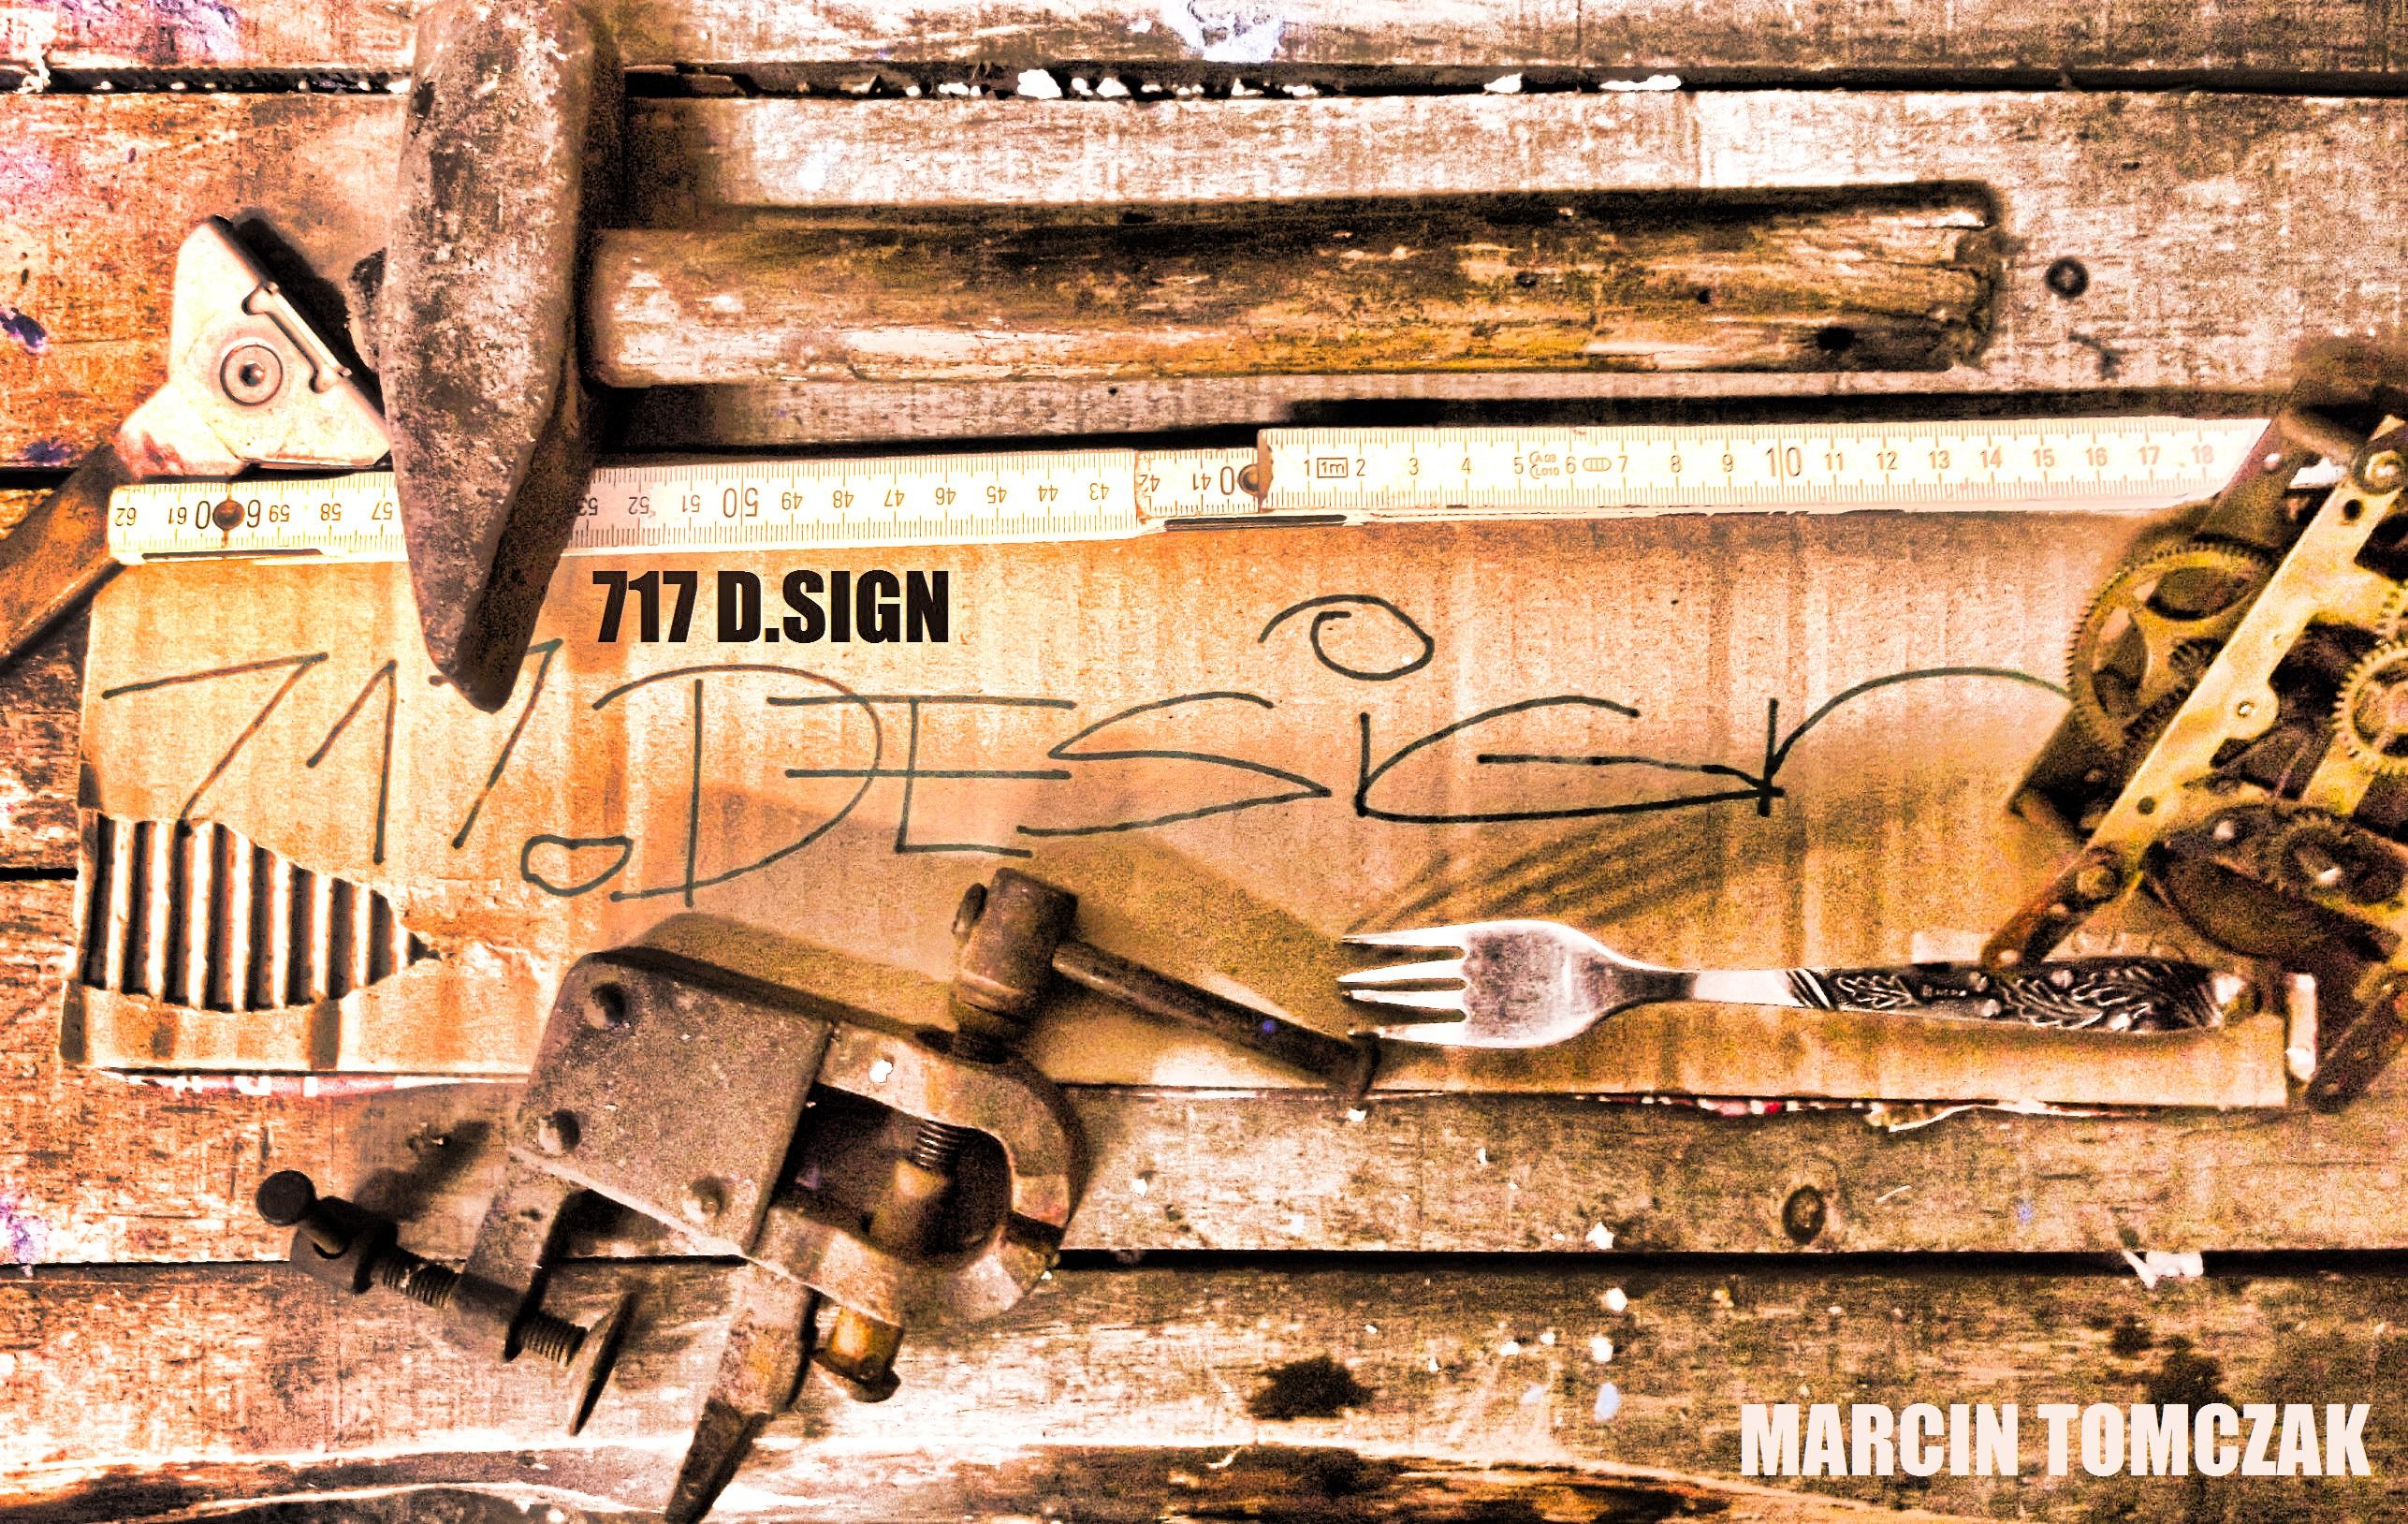 Marcin Tomczak Signature